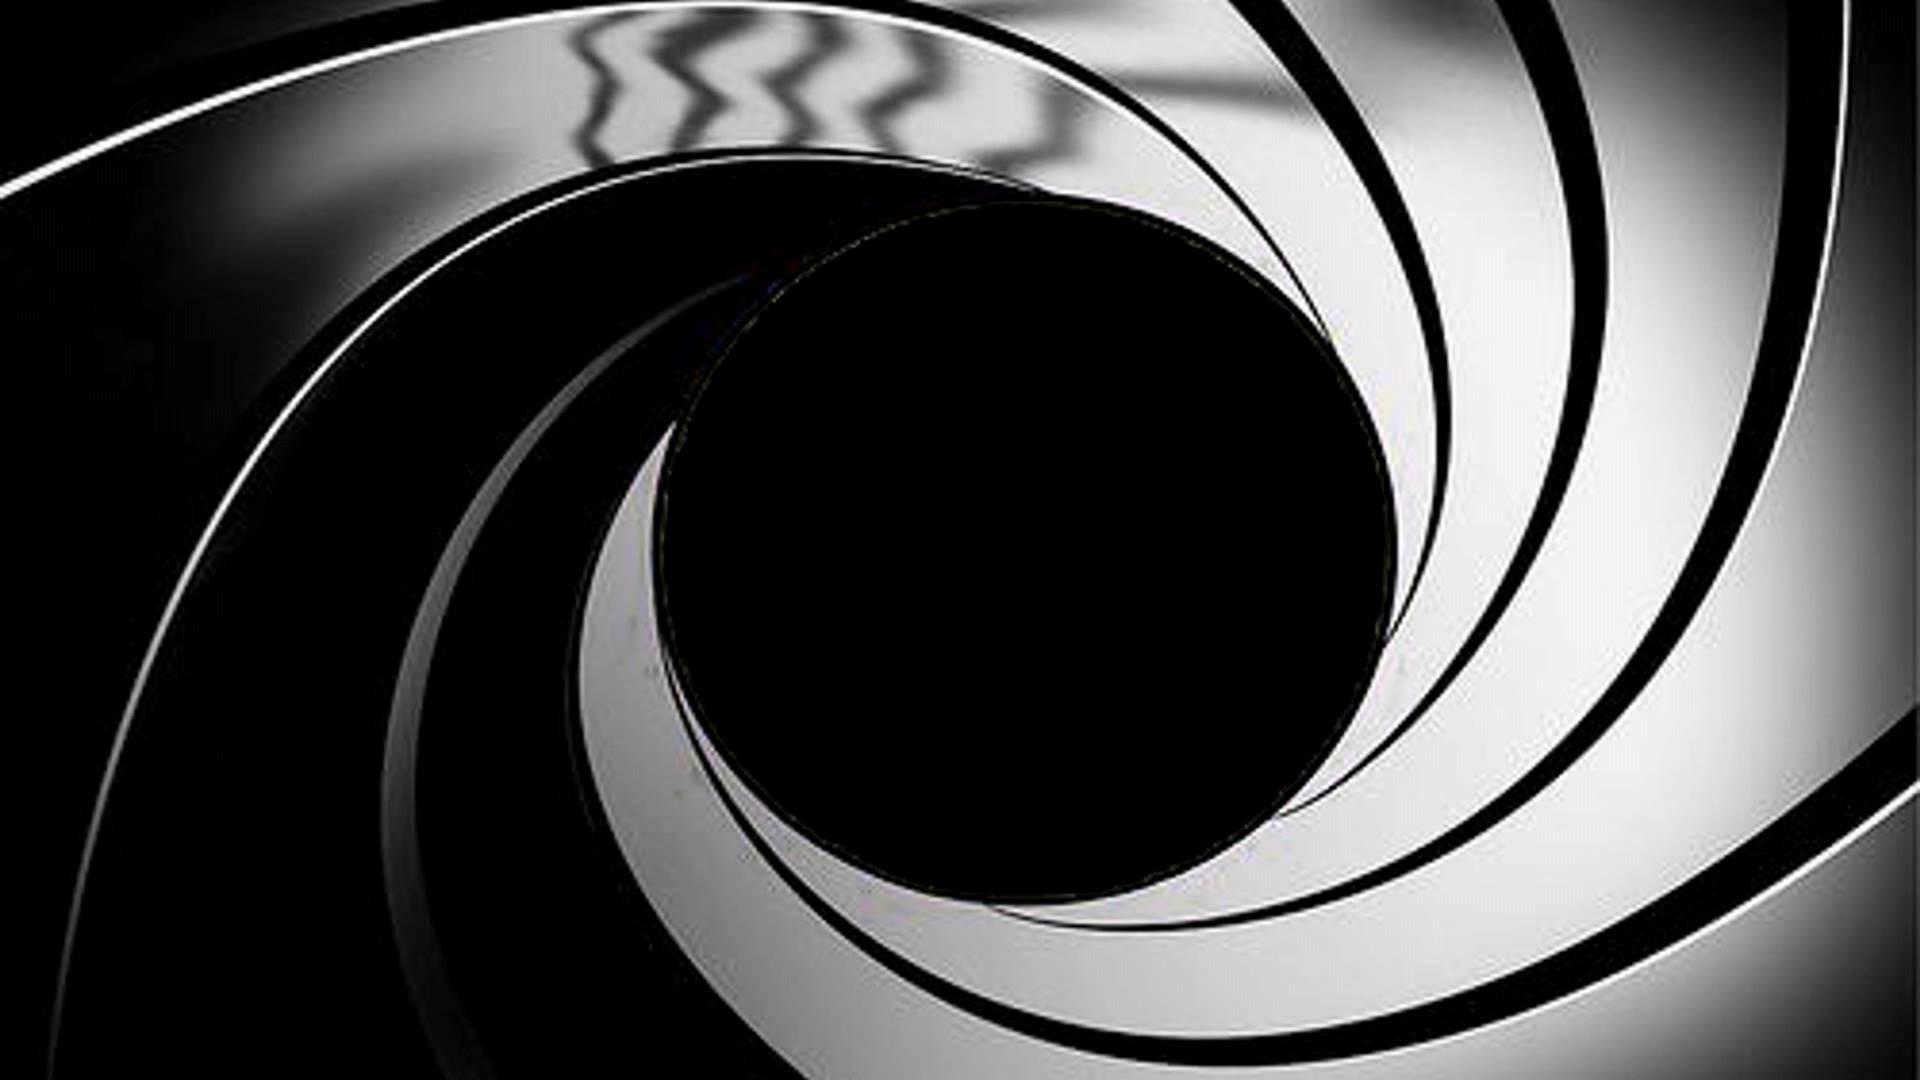 James Bond Iphone Wallpaper 72 Images